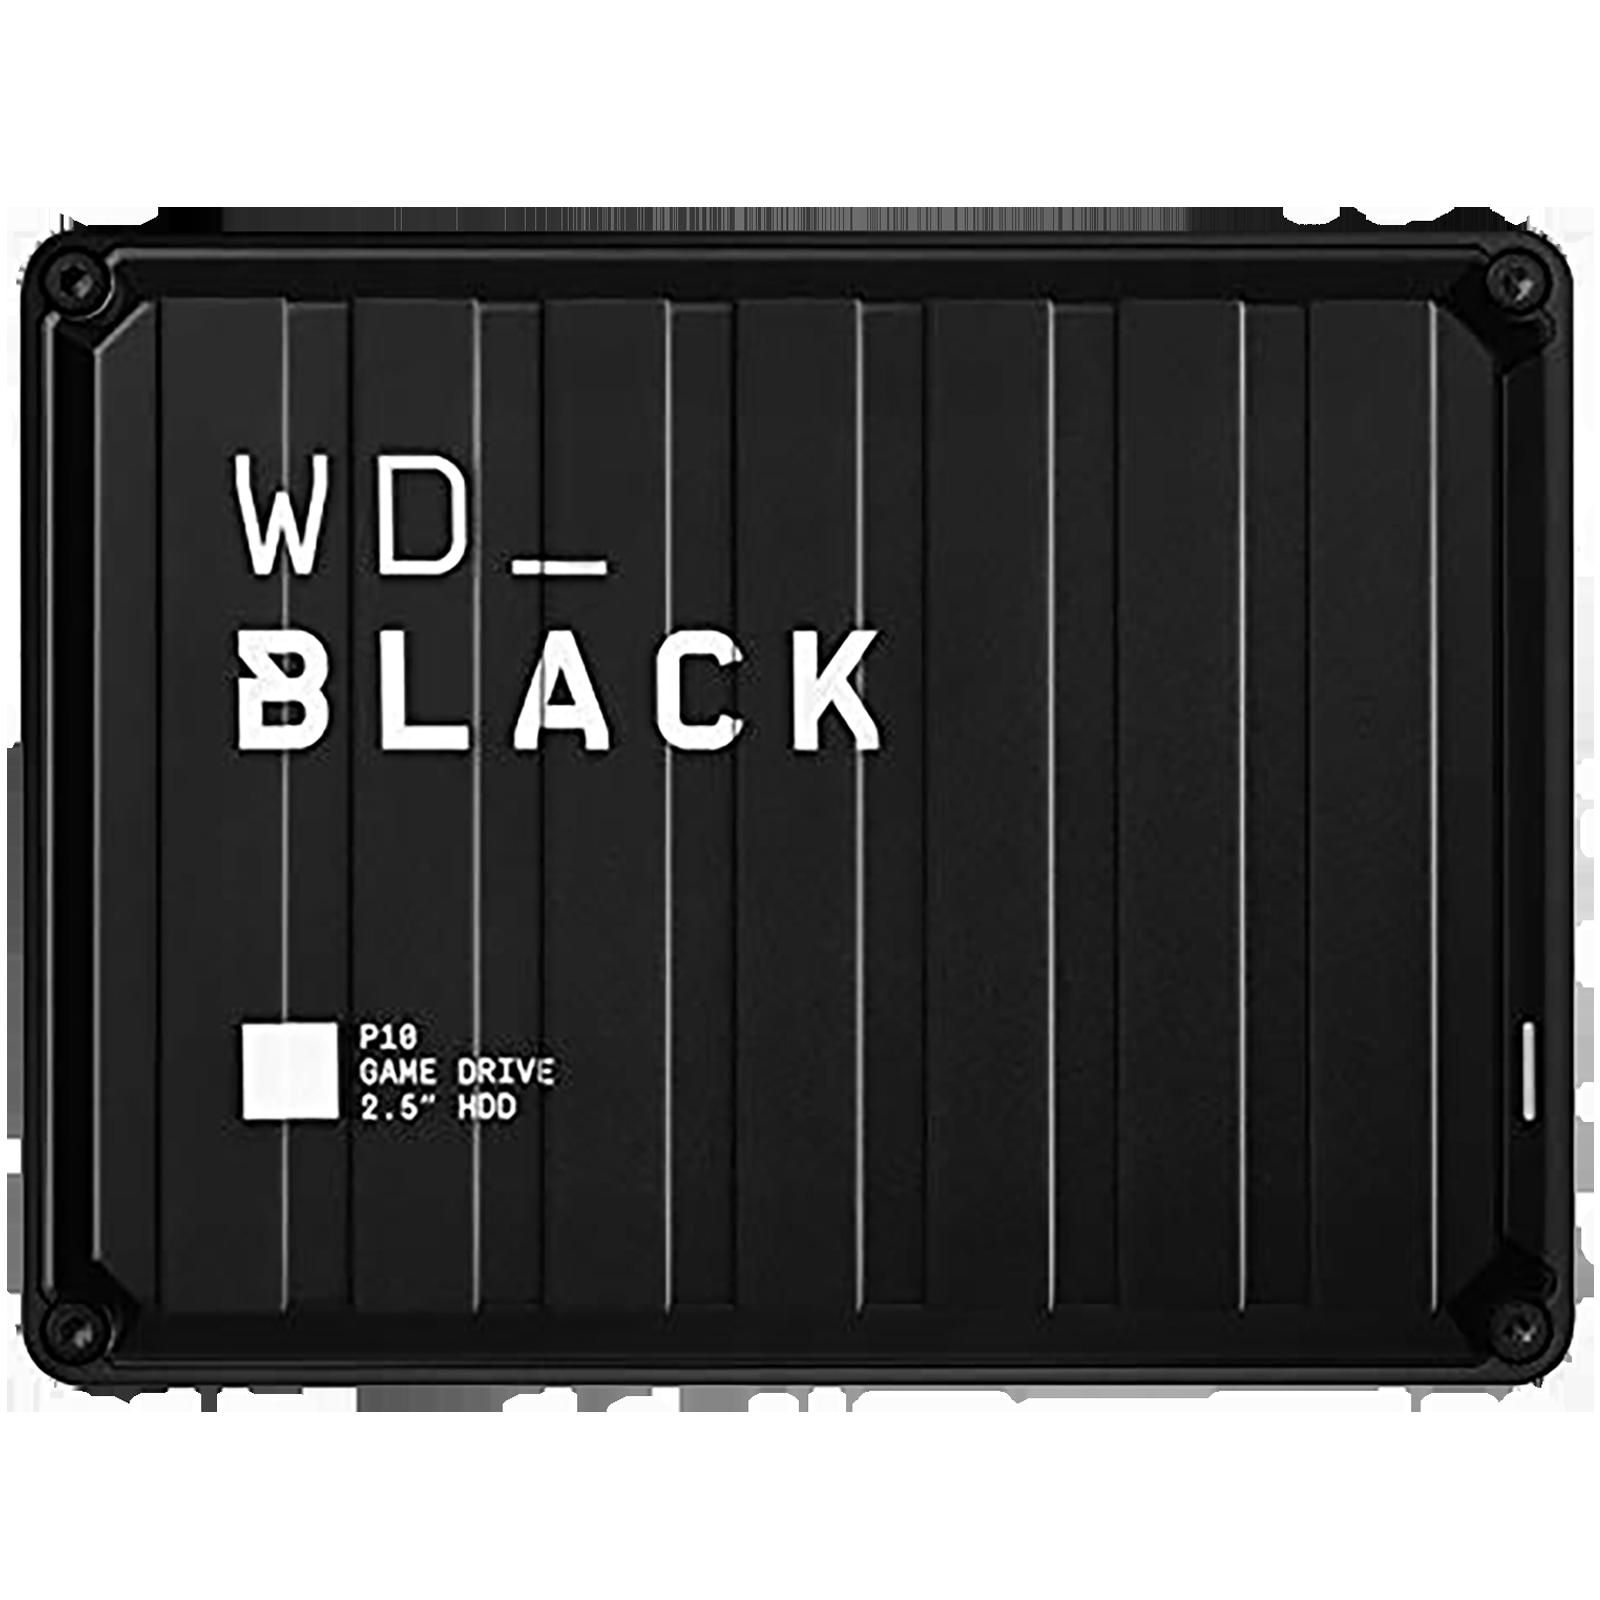 Western Digital WD_BLACK P10 4 TB USB 3.2 Game Drive (Purpose-Built For Gamers, WDBA3A0040BBK-WESN, Black)_1